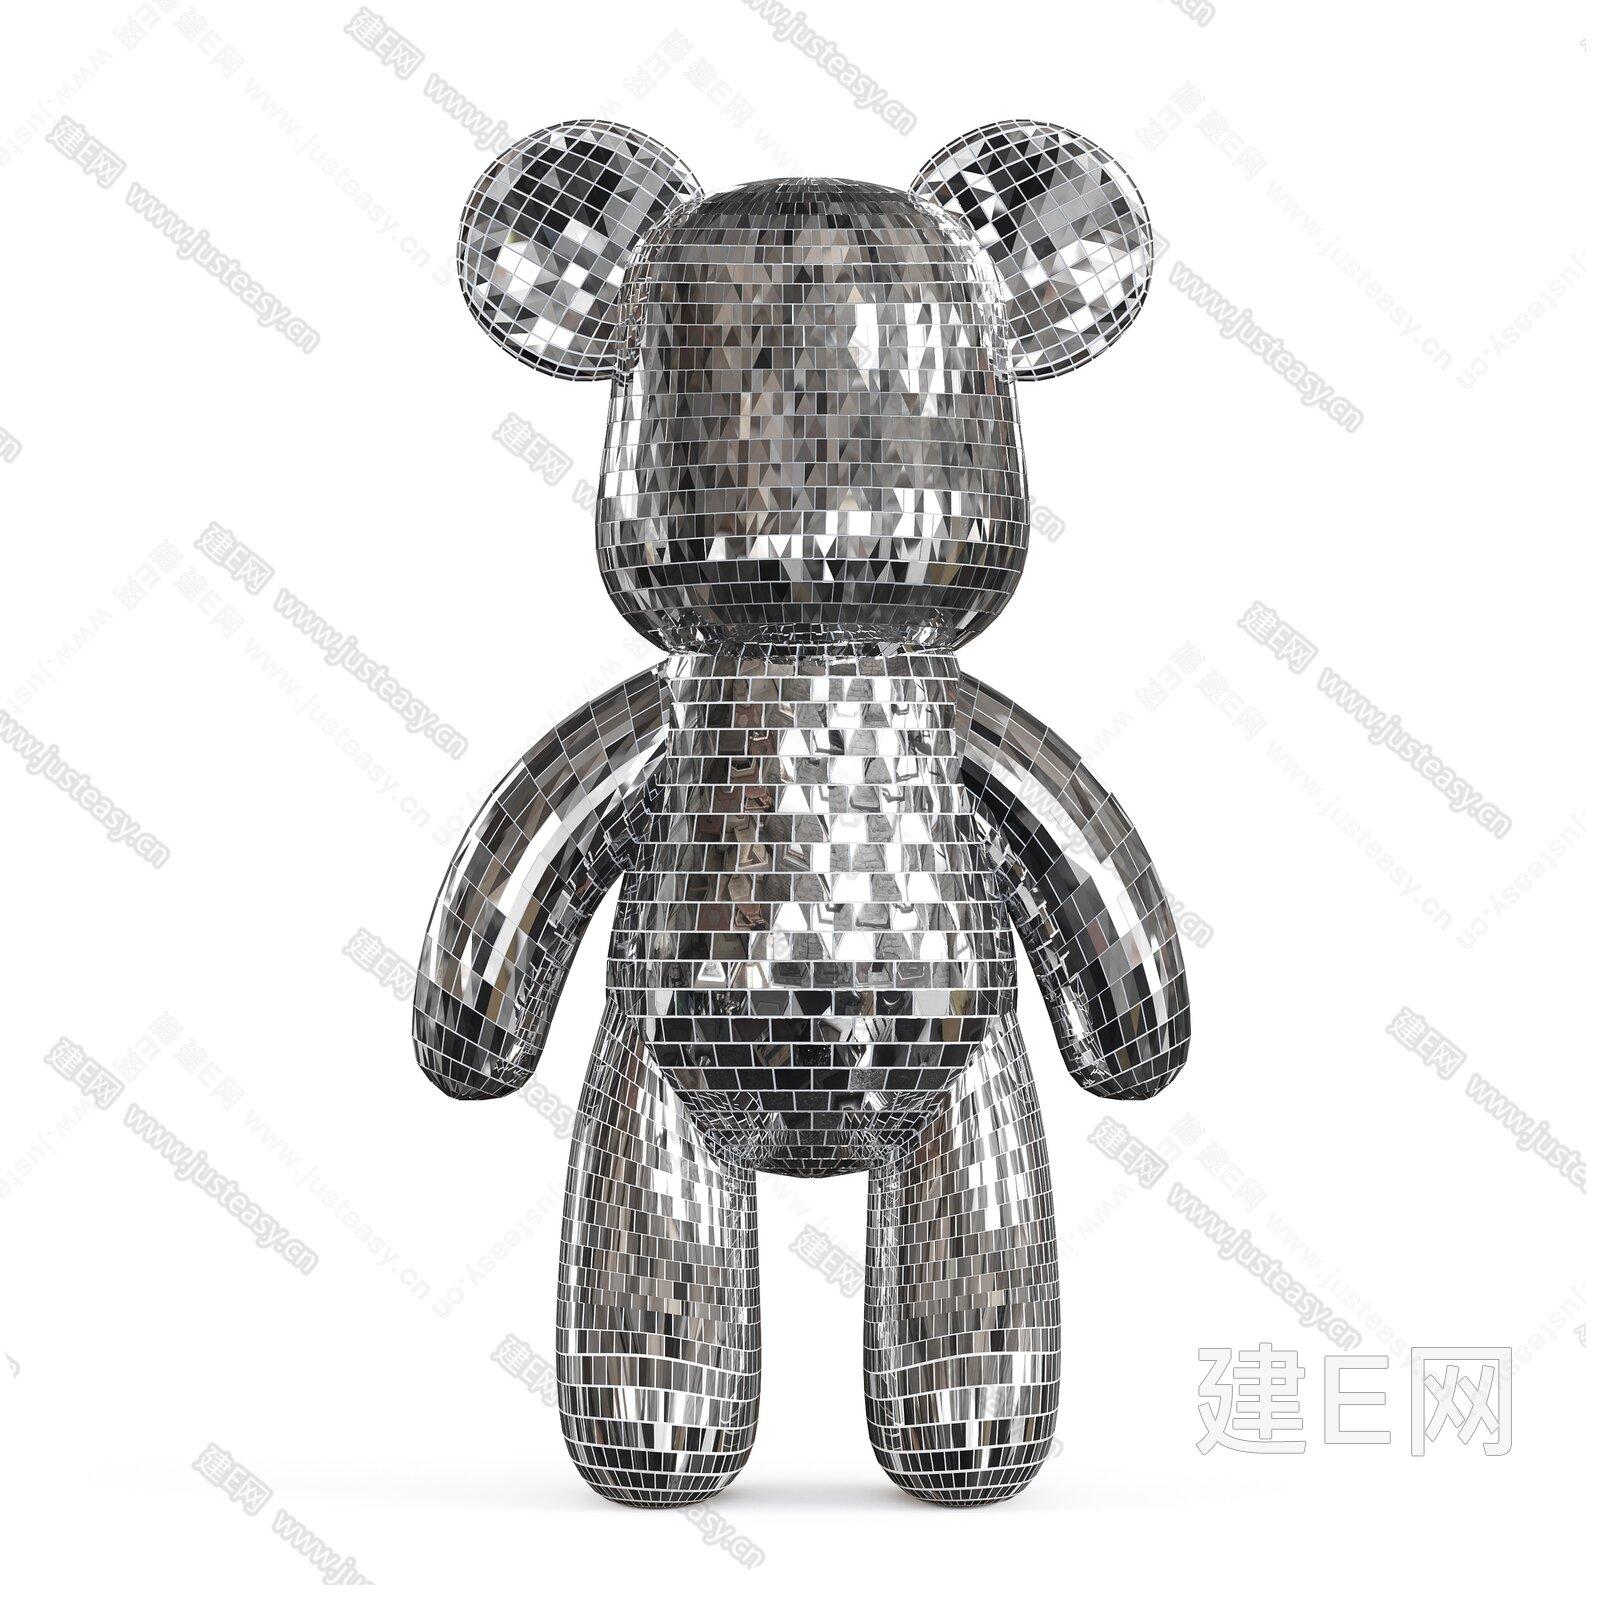 YOOWOW有窝 纯手工镶嵌创意卡通暴力熊 艺术装饰雕塑摆件 样板房桌面摆件3d模型